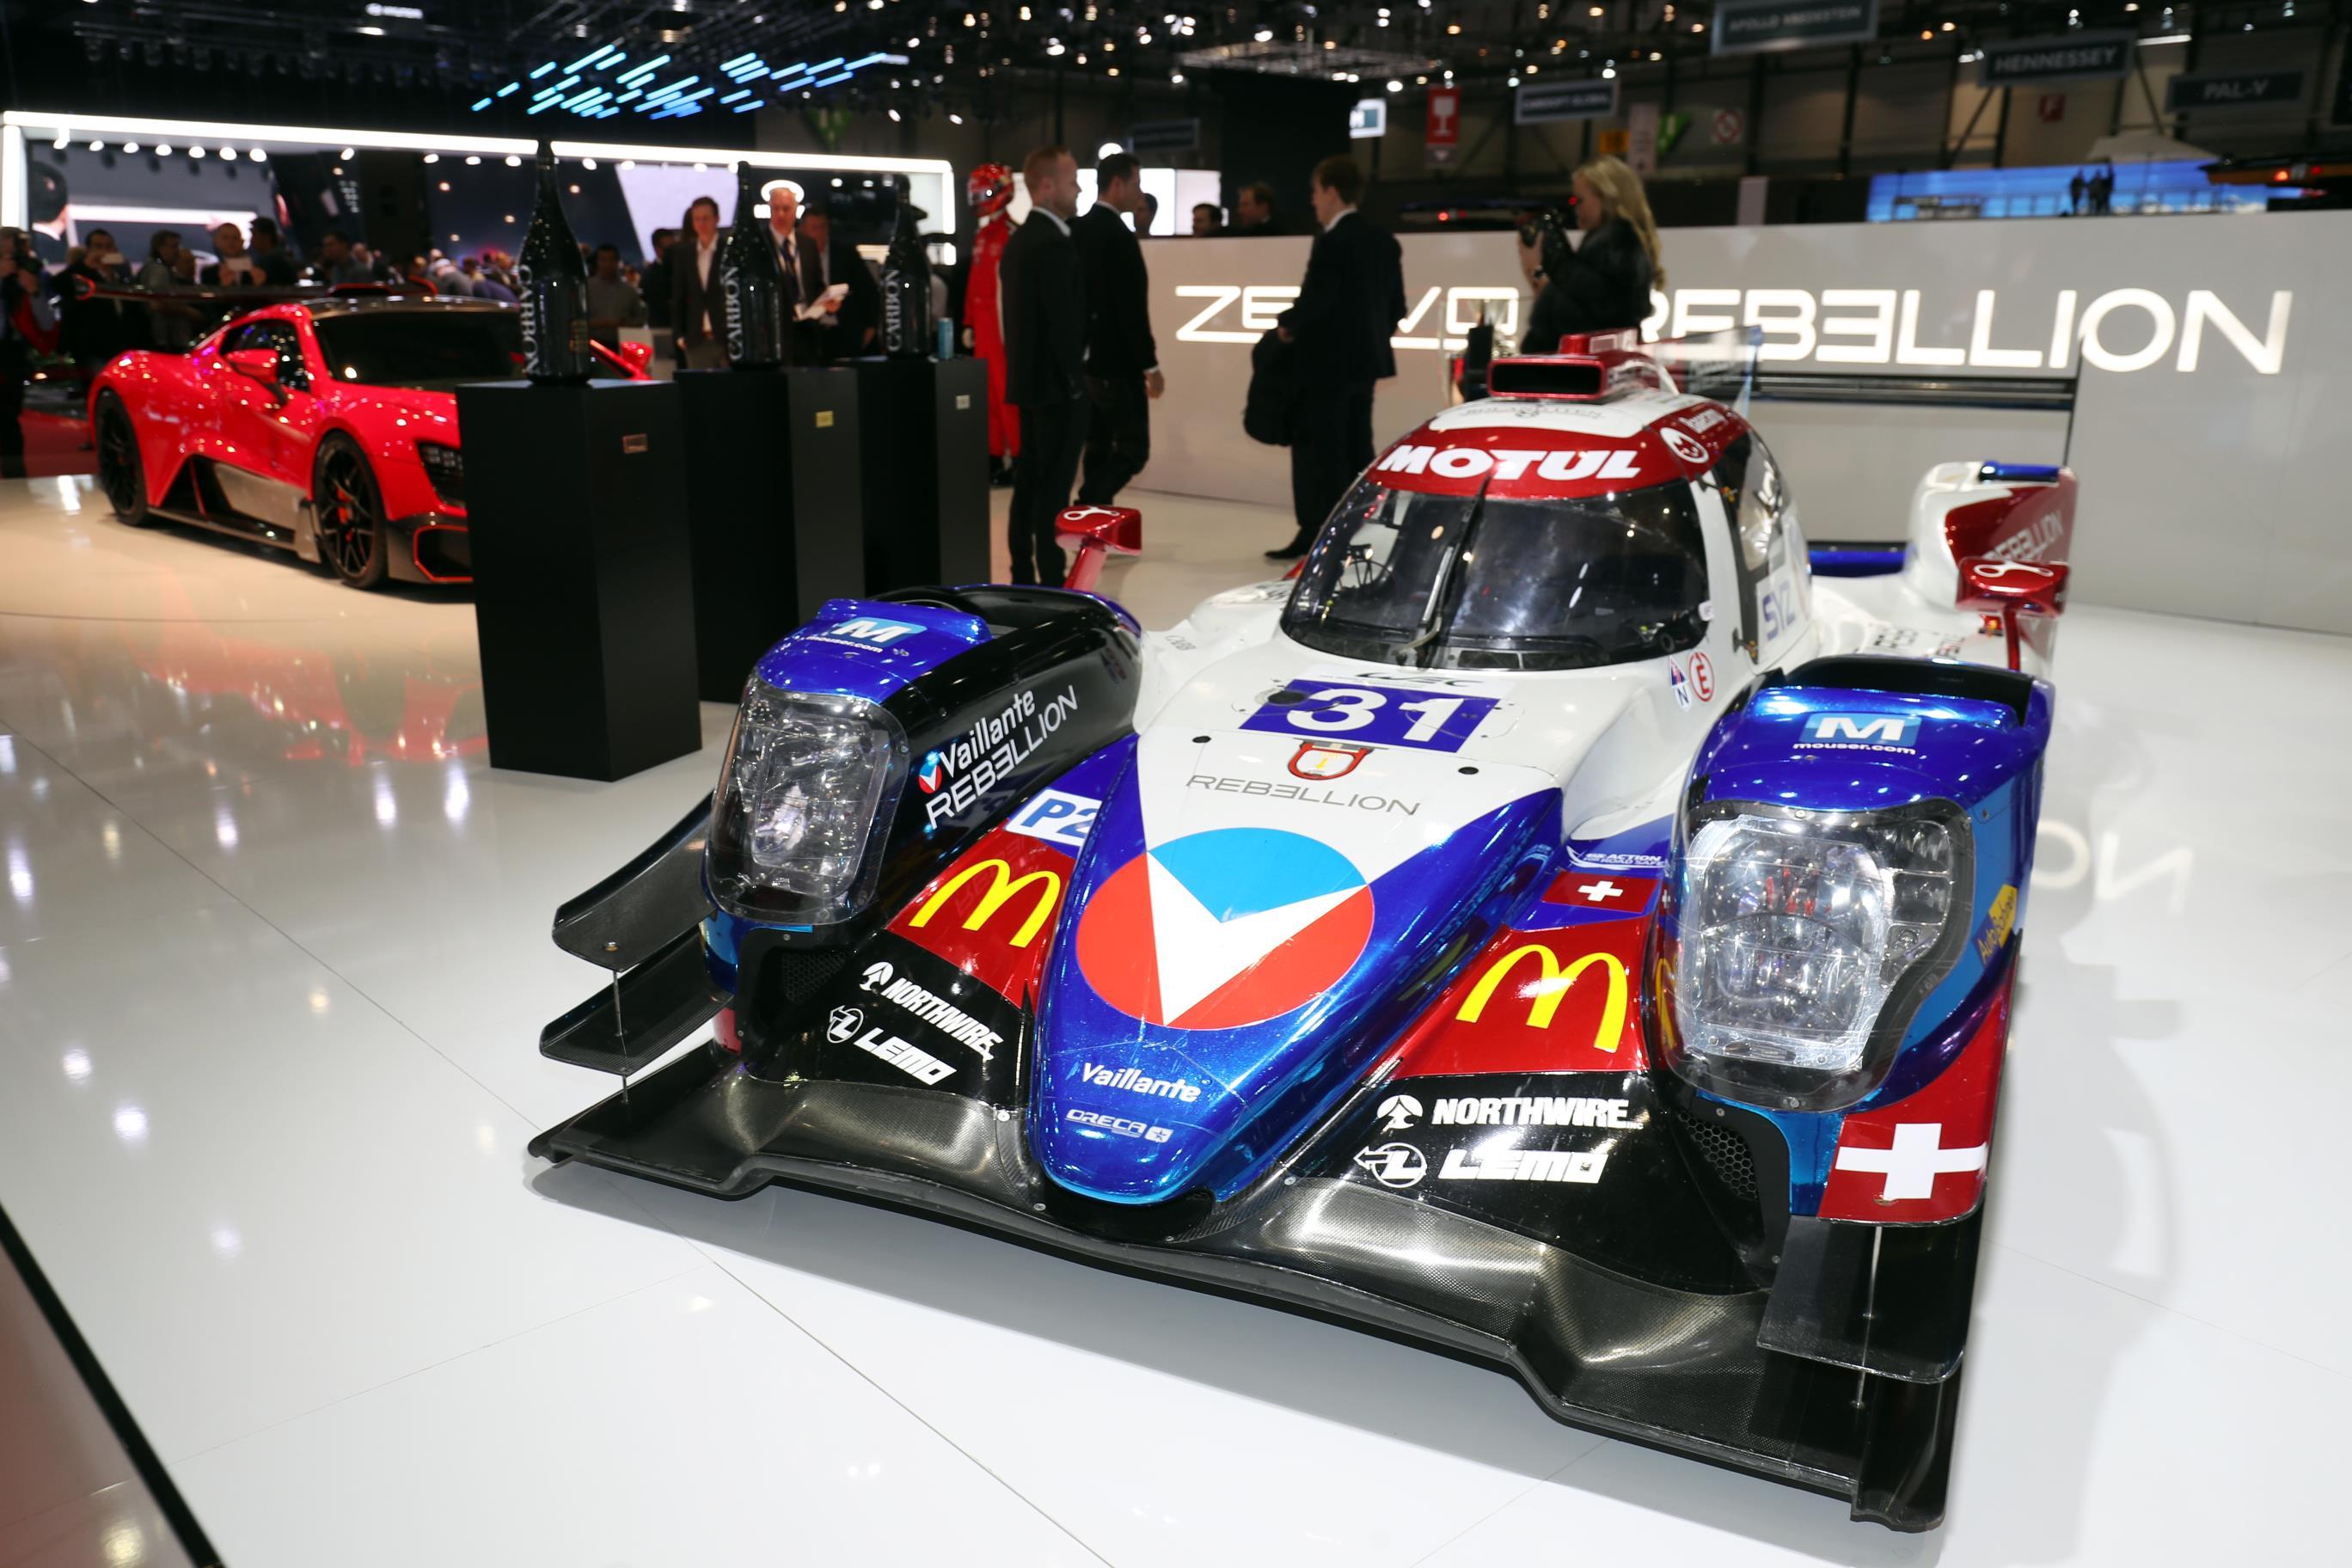 Geneva Motor Show 2018 Mega Gallery Part 1 (223)